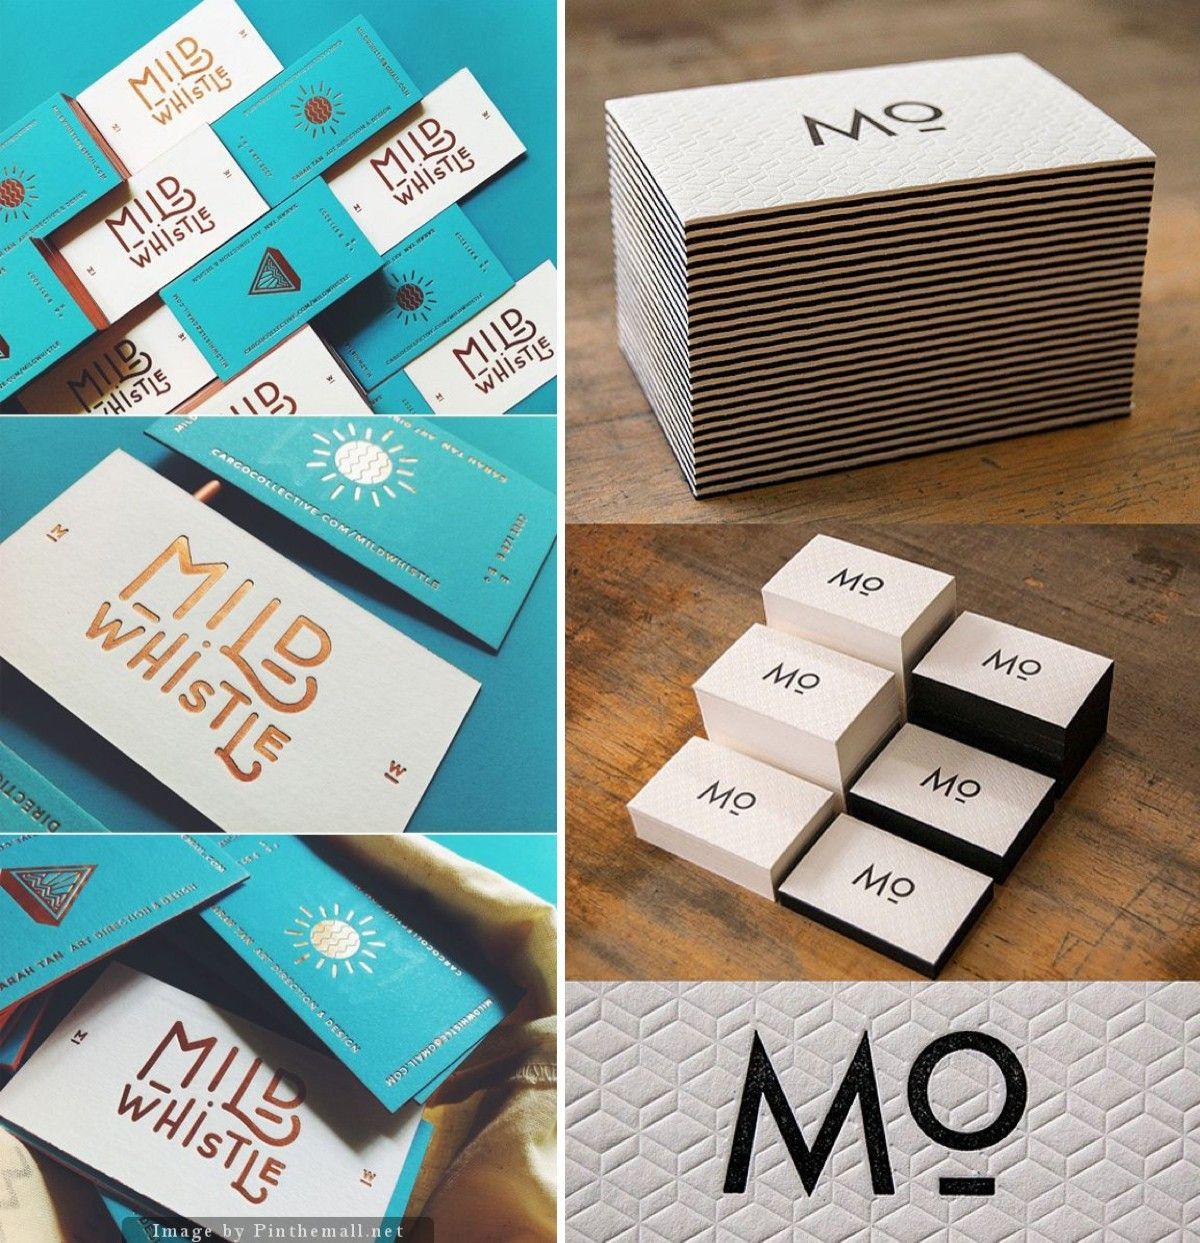 Voc sabe o que letterpress letterpresses and business cards business cards colourmoves Image collections